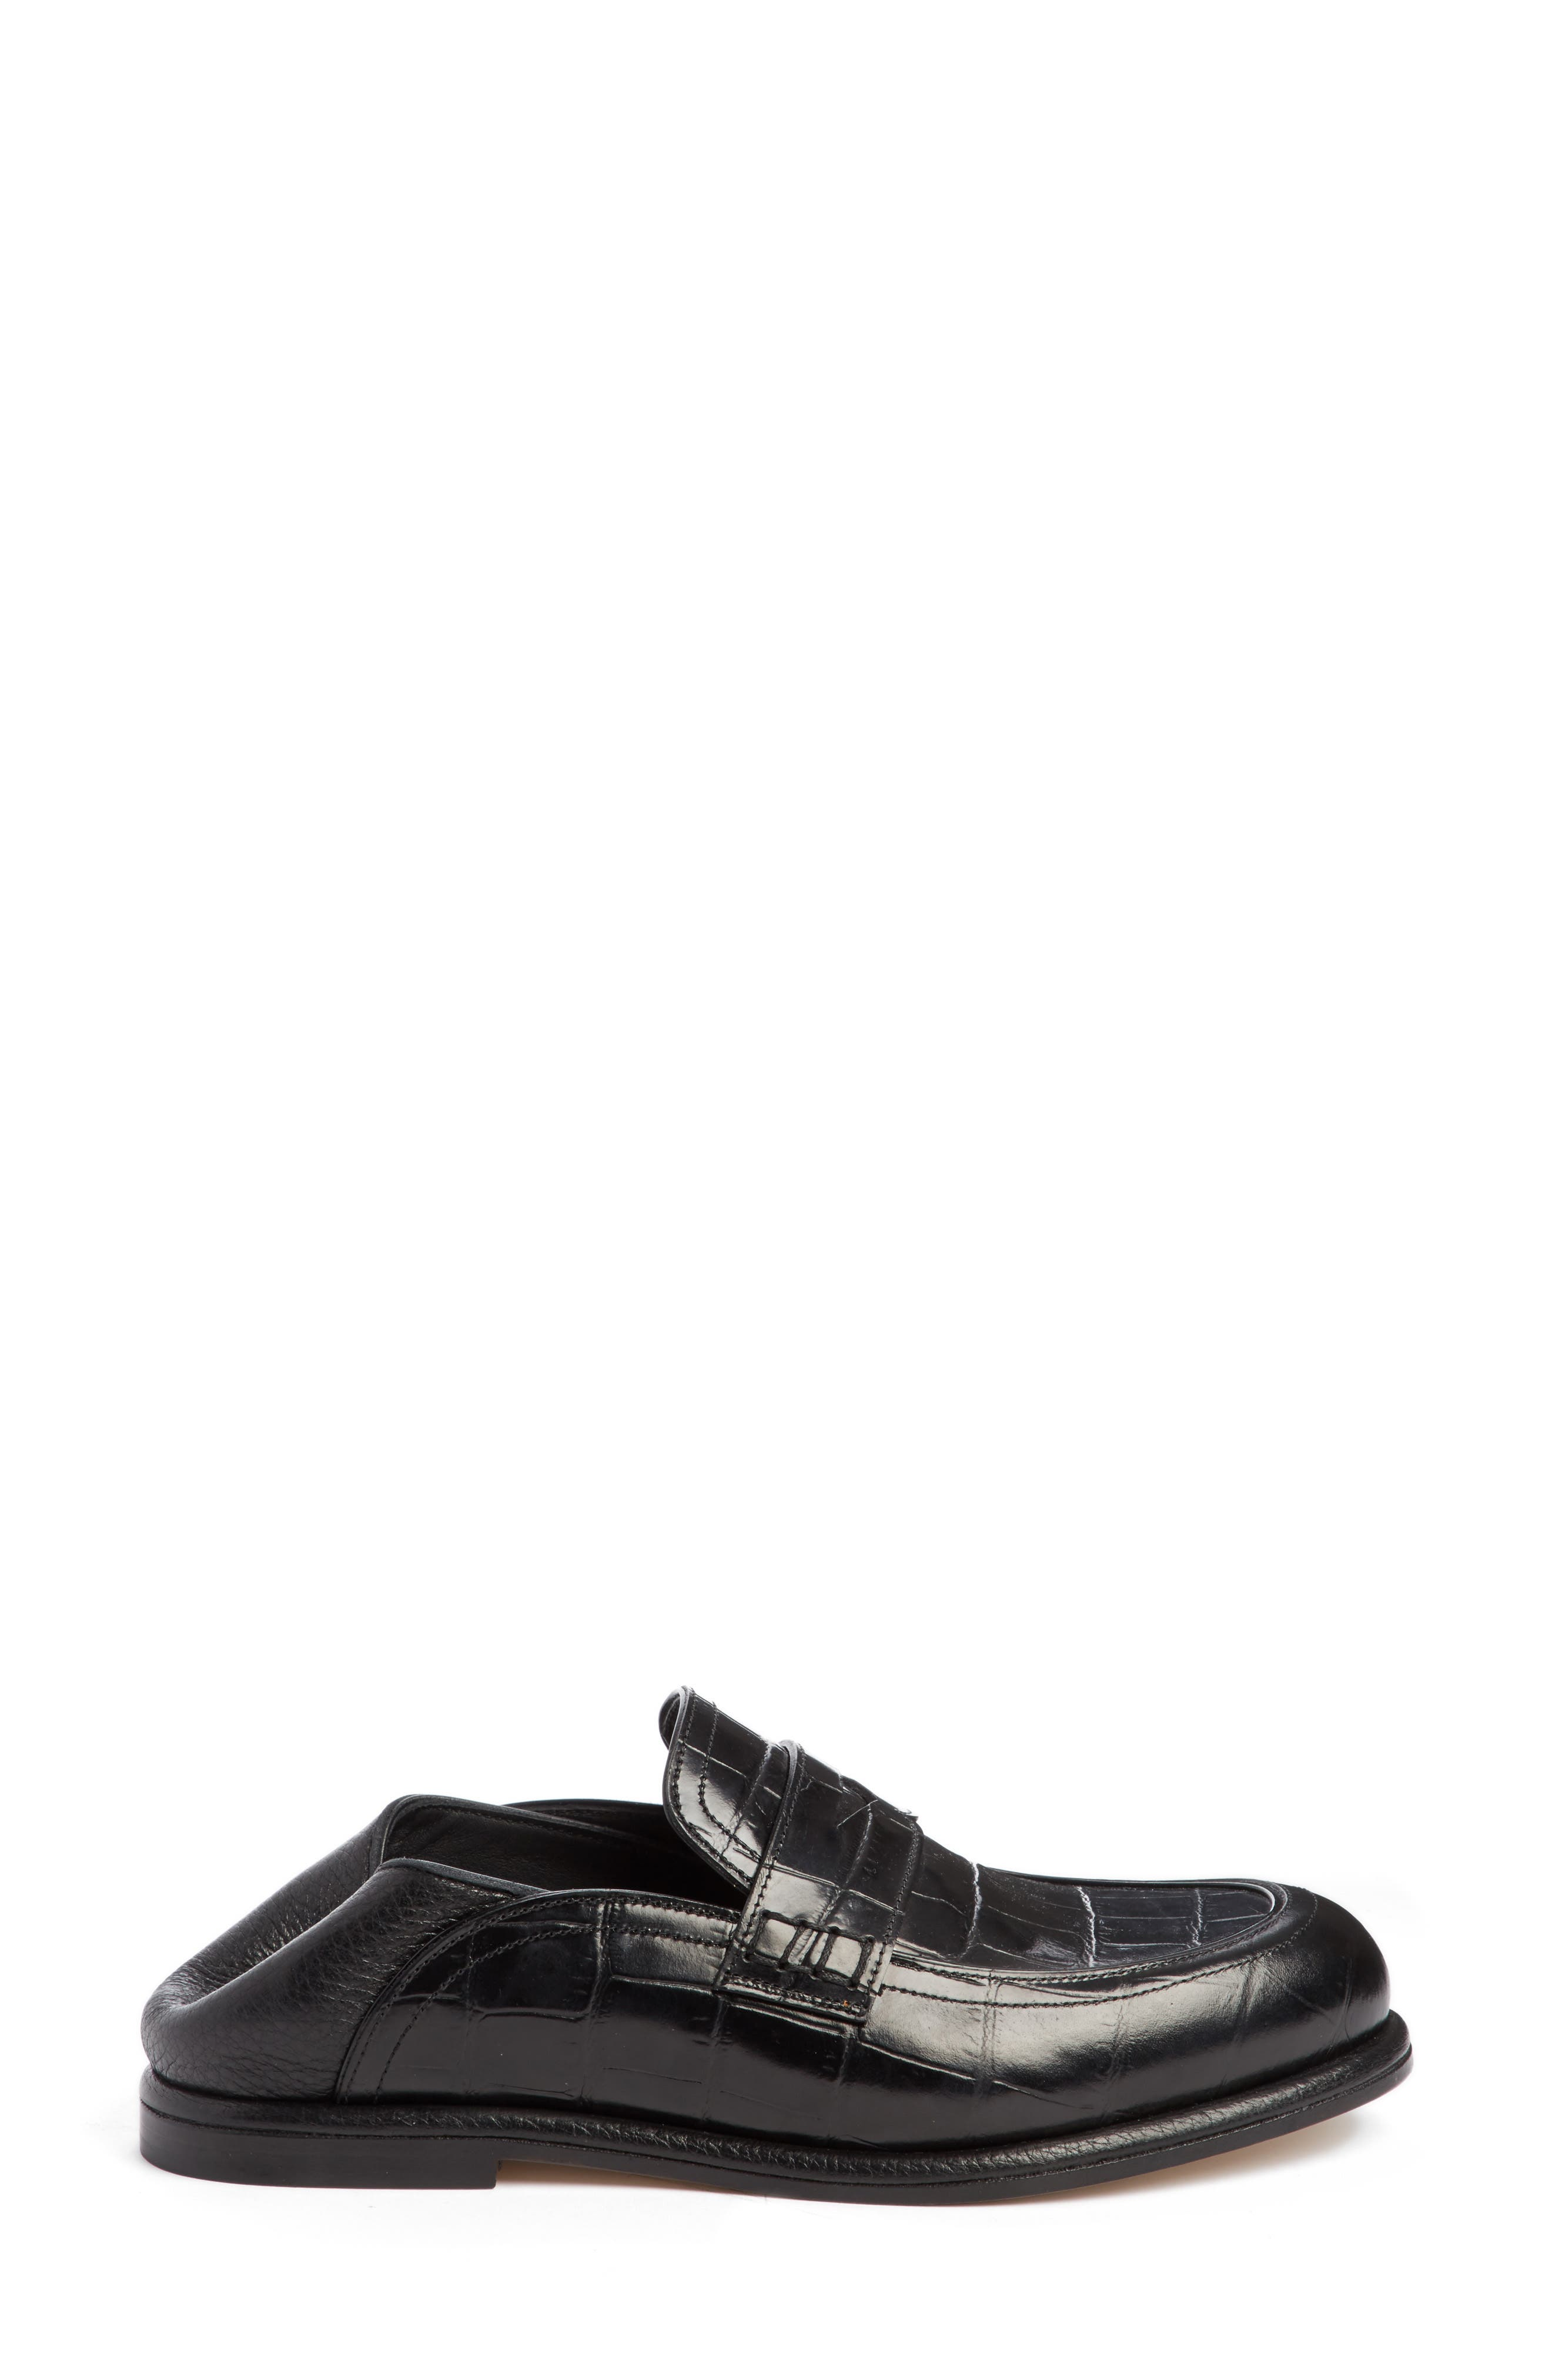 Croc Embossed Convertible Loafer,                             Alternate thumbnail 4, color,                             Black